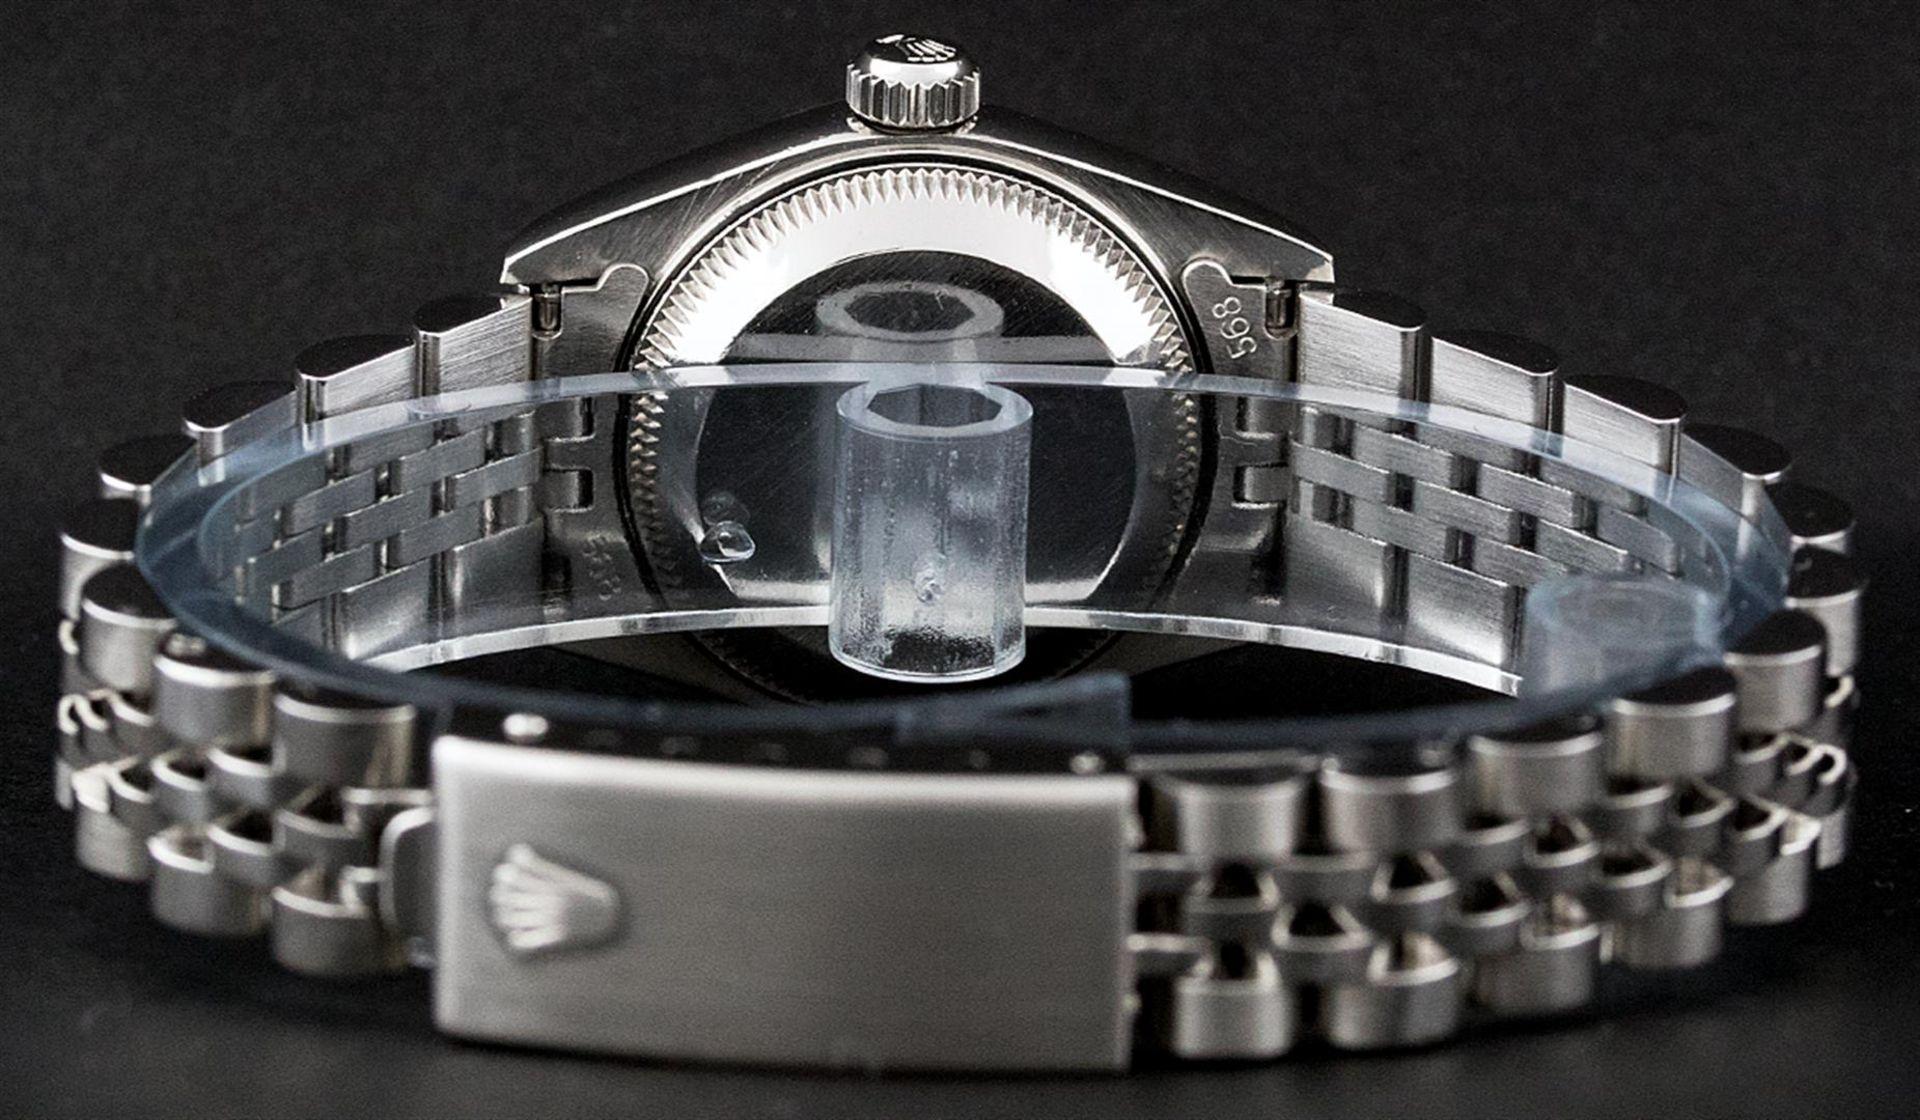 Rolex Ladies Stainless Steel Silver Index 26MM Quickset Datejust Wristwatch - Image 7 of 9